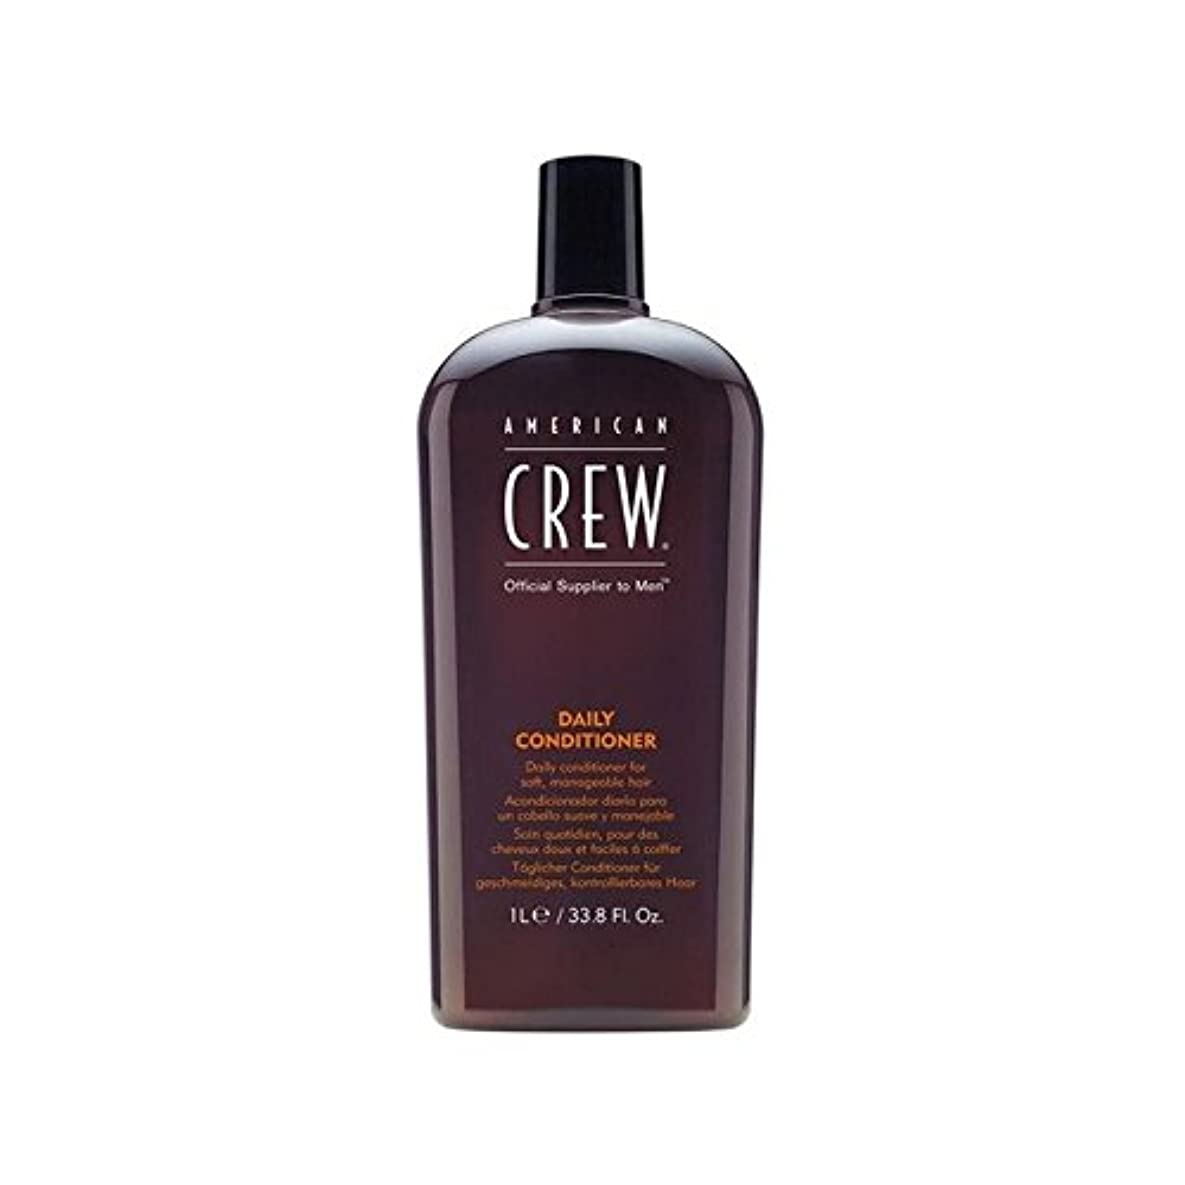 American Crew Daily Conditioner (1L) - アメリカの乗組員の日常コンディショナー(1リットル) [並行輸入品]